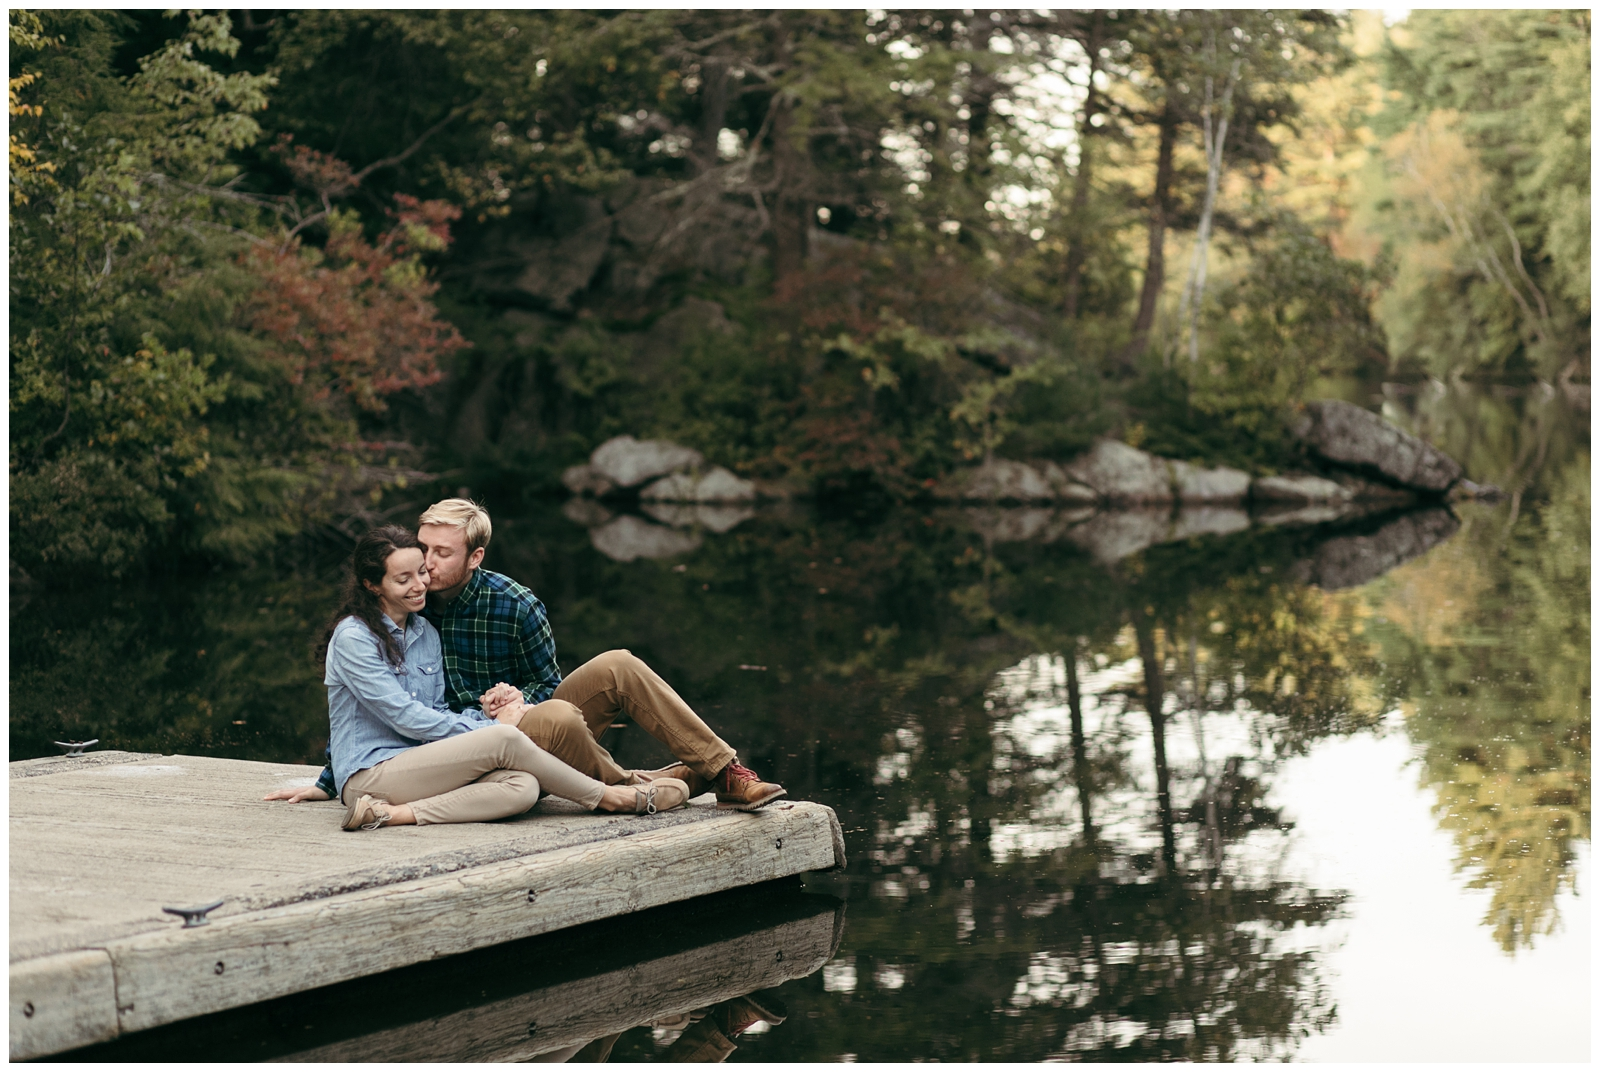 Connecticut-Engagement-Photographer-Bailey-Q-Photo-26.jpg